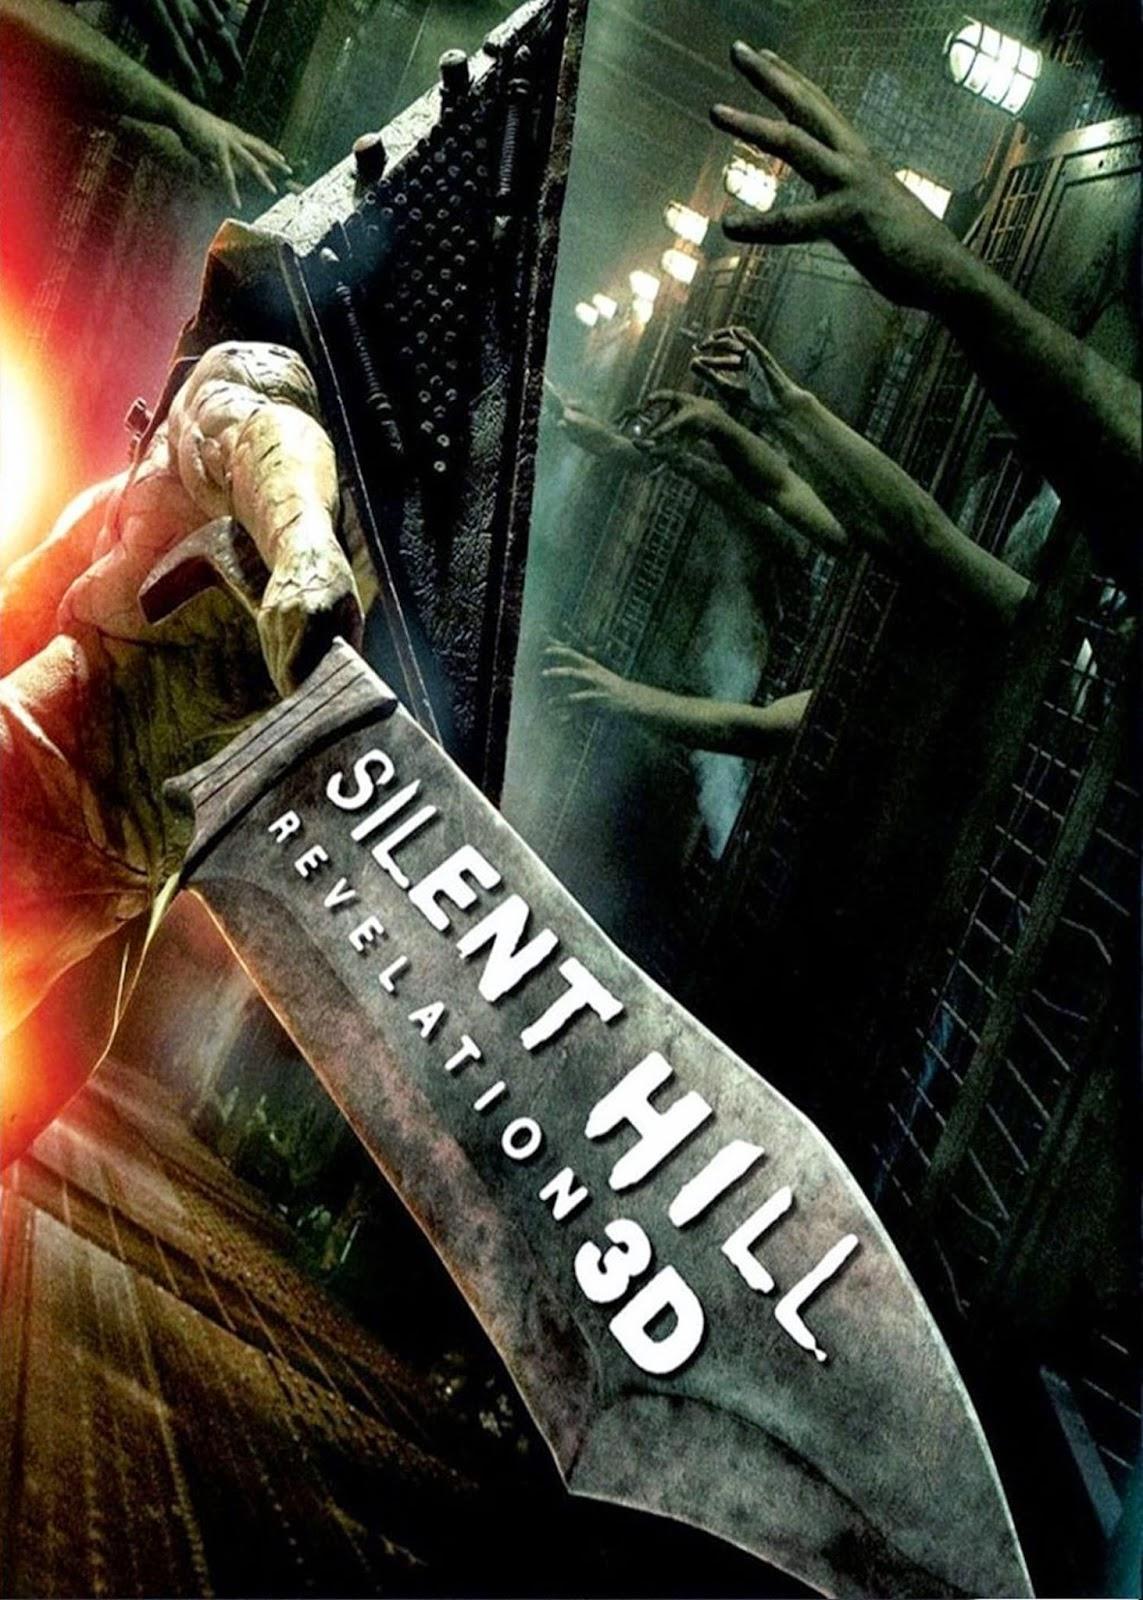 Silent Hill: Revelation 3D - Silent Hill 2 (2012)